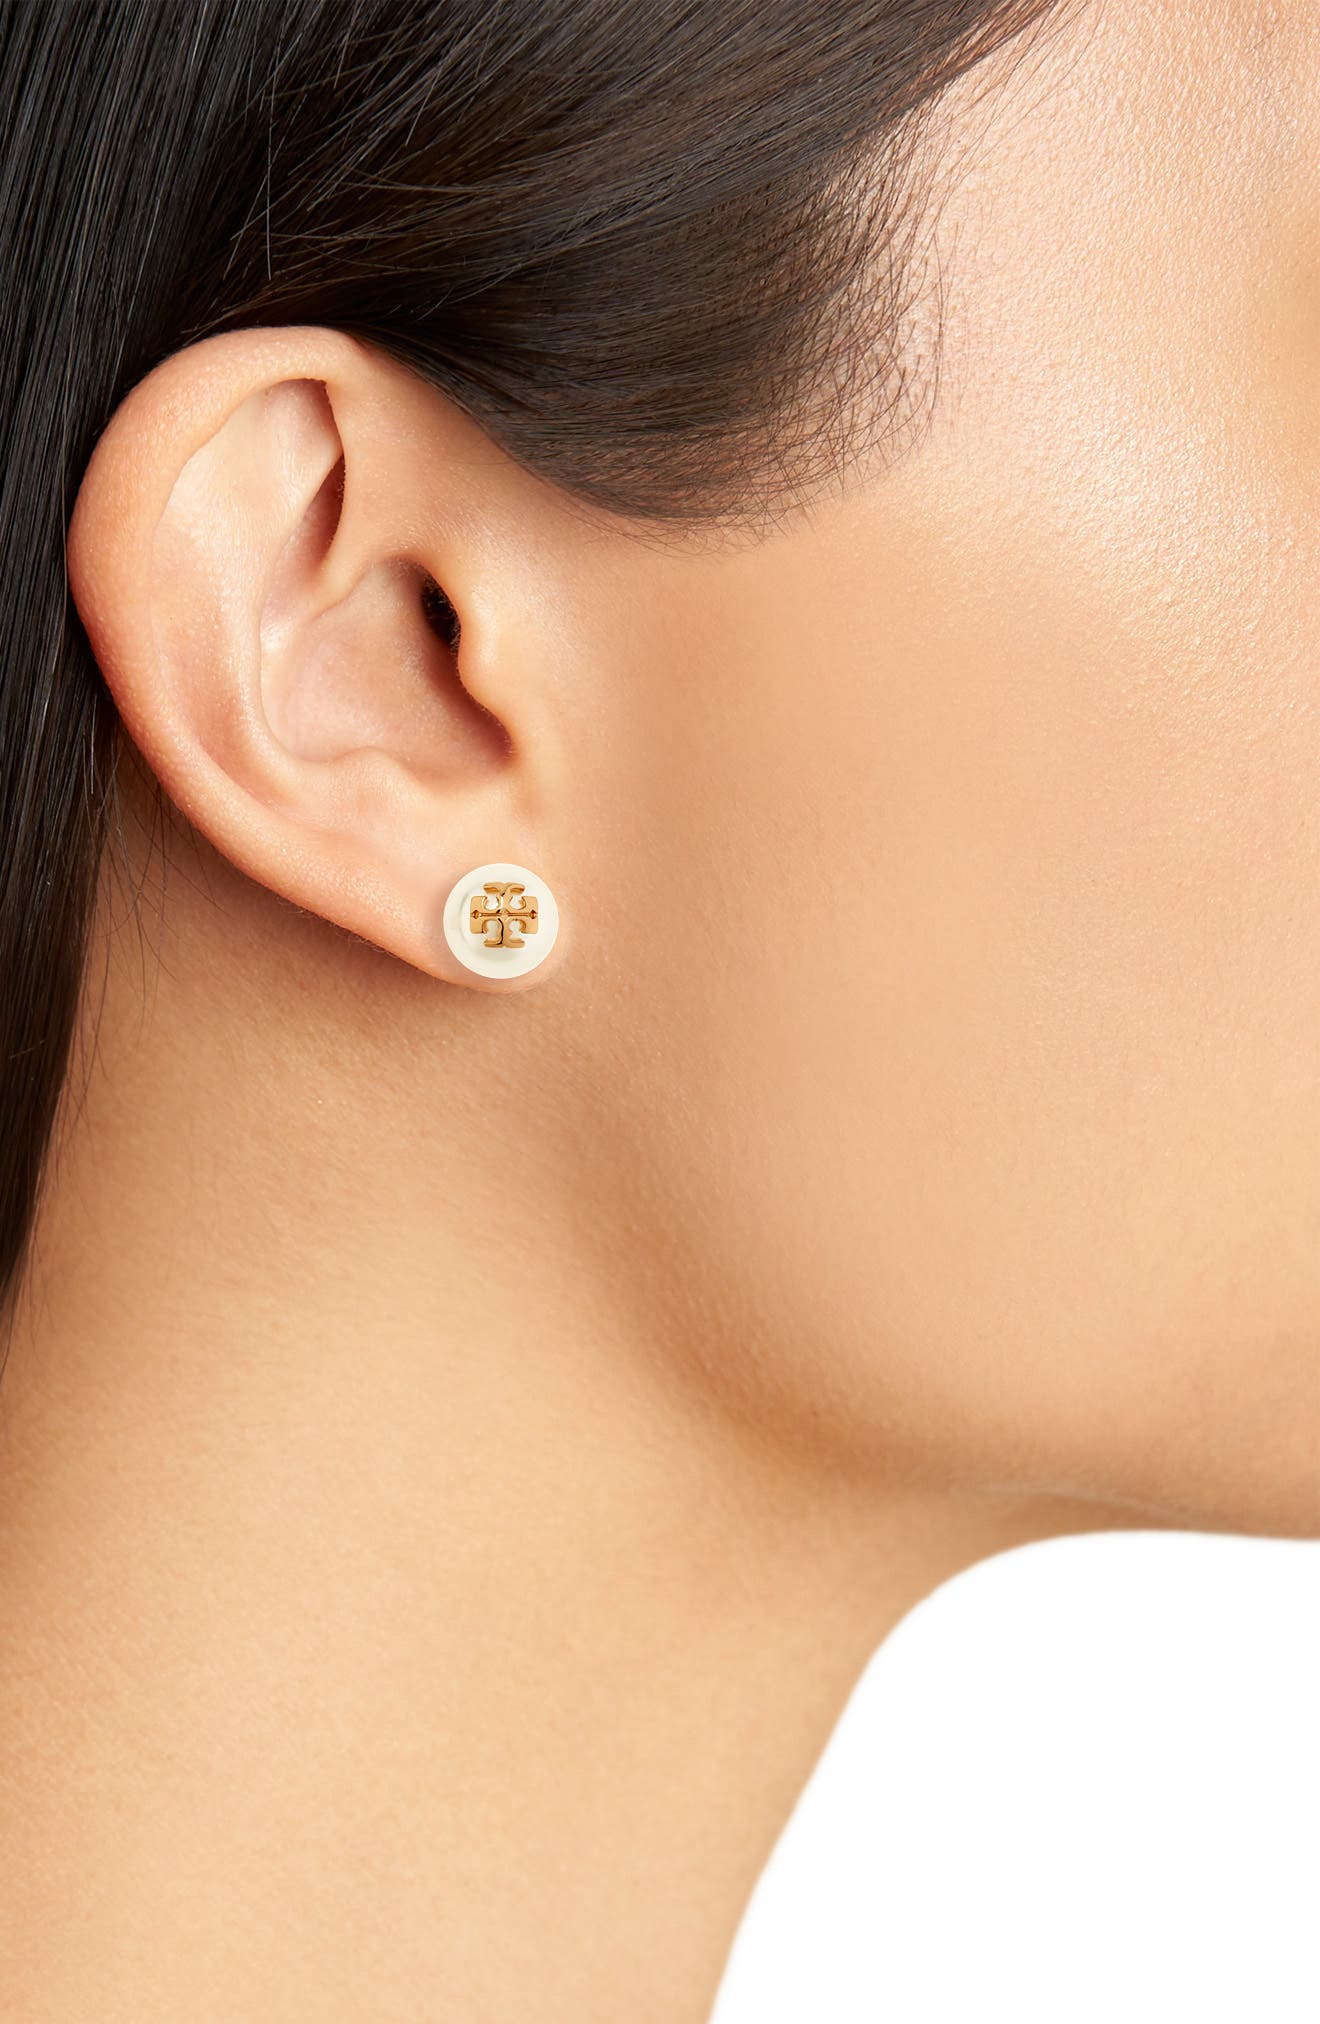 TORY BURCH Swarovski Crystal Pearl Logo Stud Earrings, Main, color, IVORY/ TORY GOLD